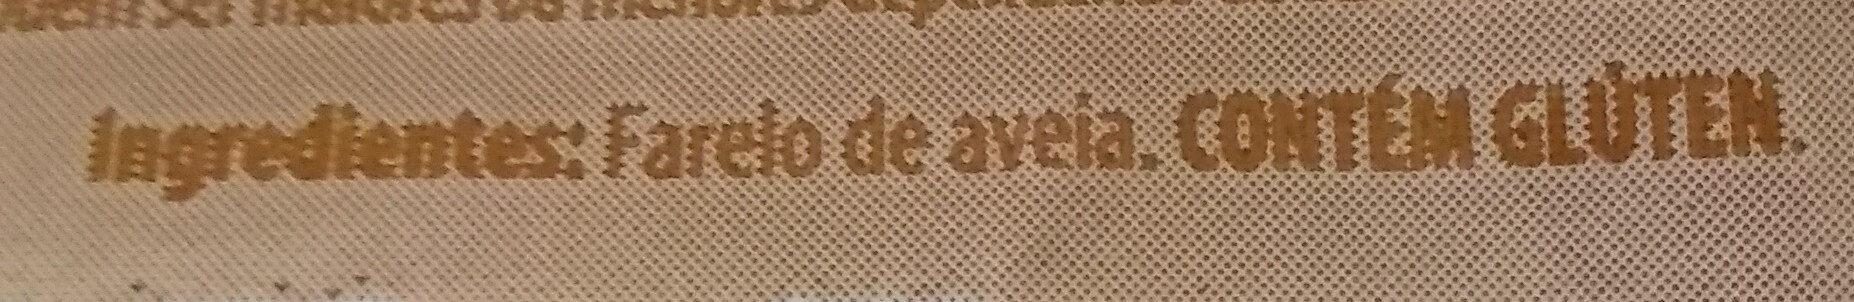 Farelo de Aveia - Ingredients - pt